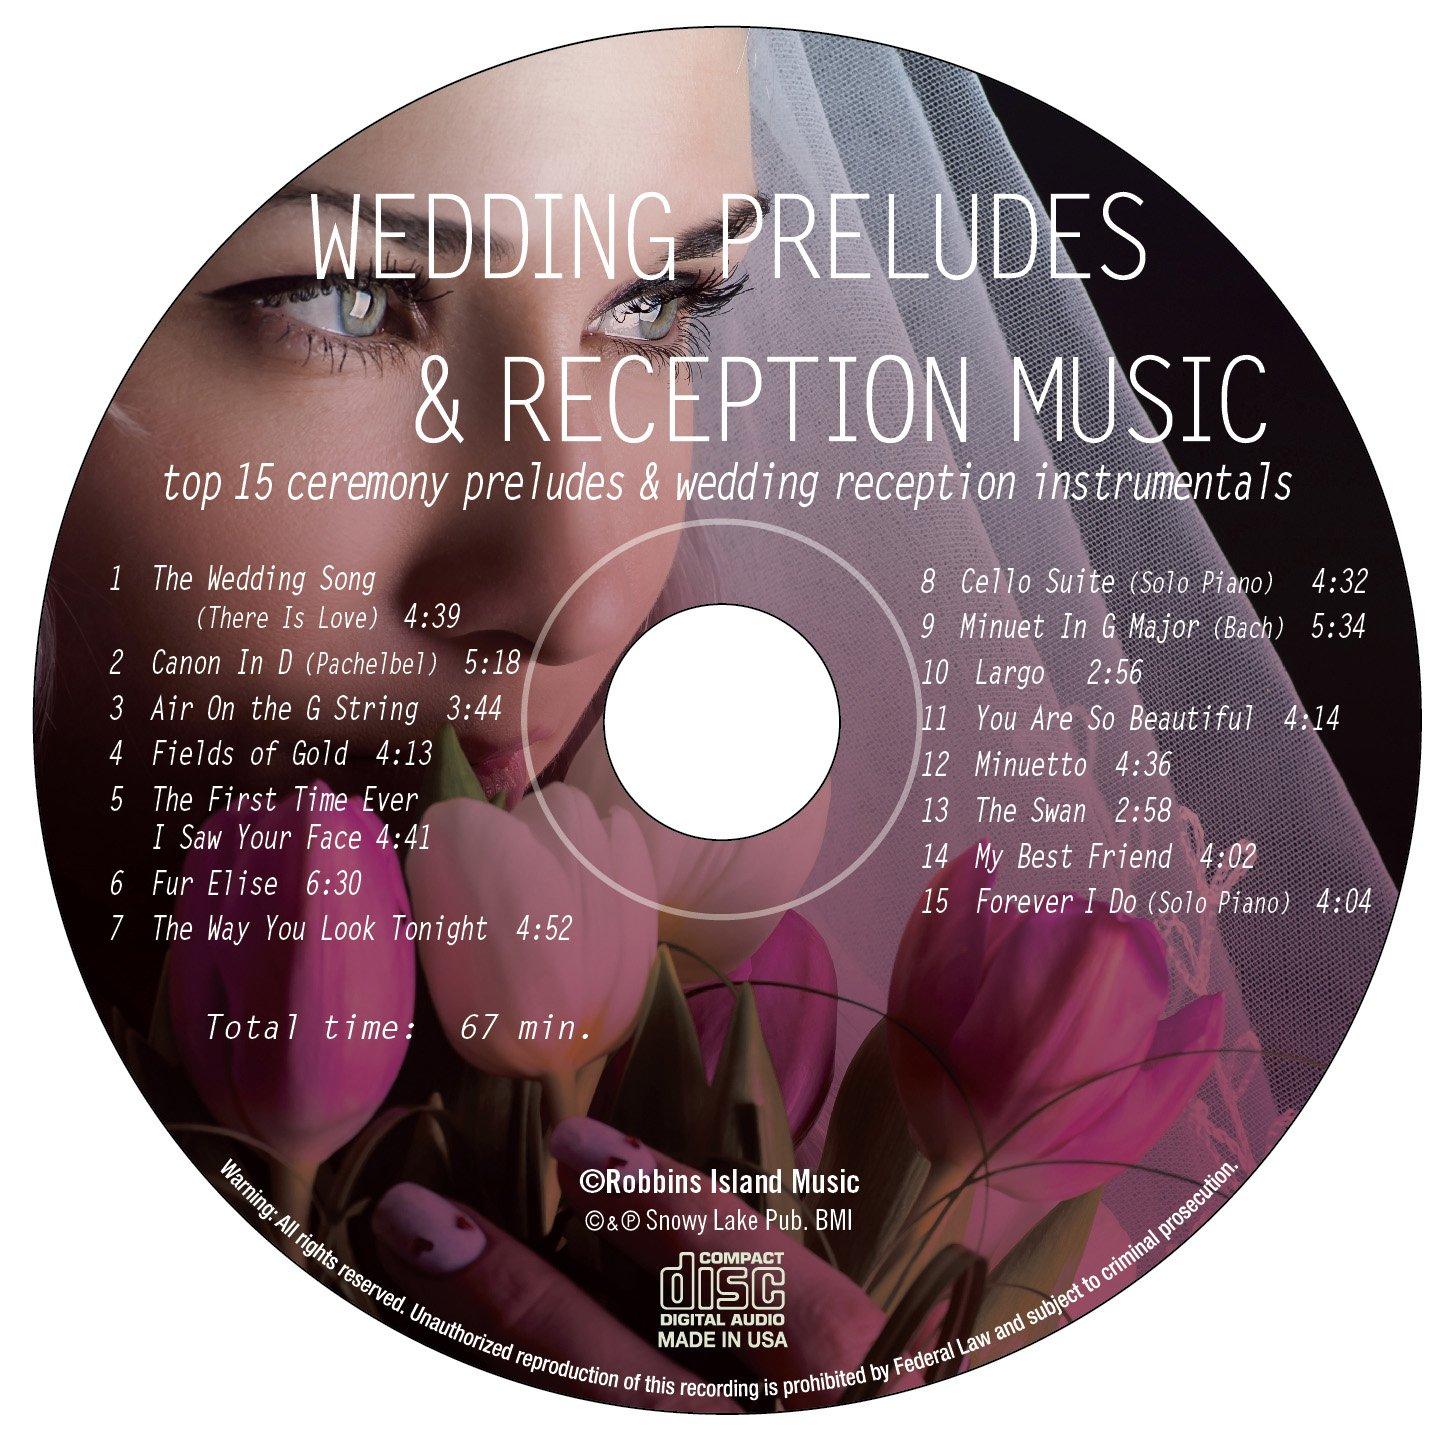 Akim Bliss Wedding Preludes Reception Music Top 15 Ceremony